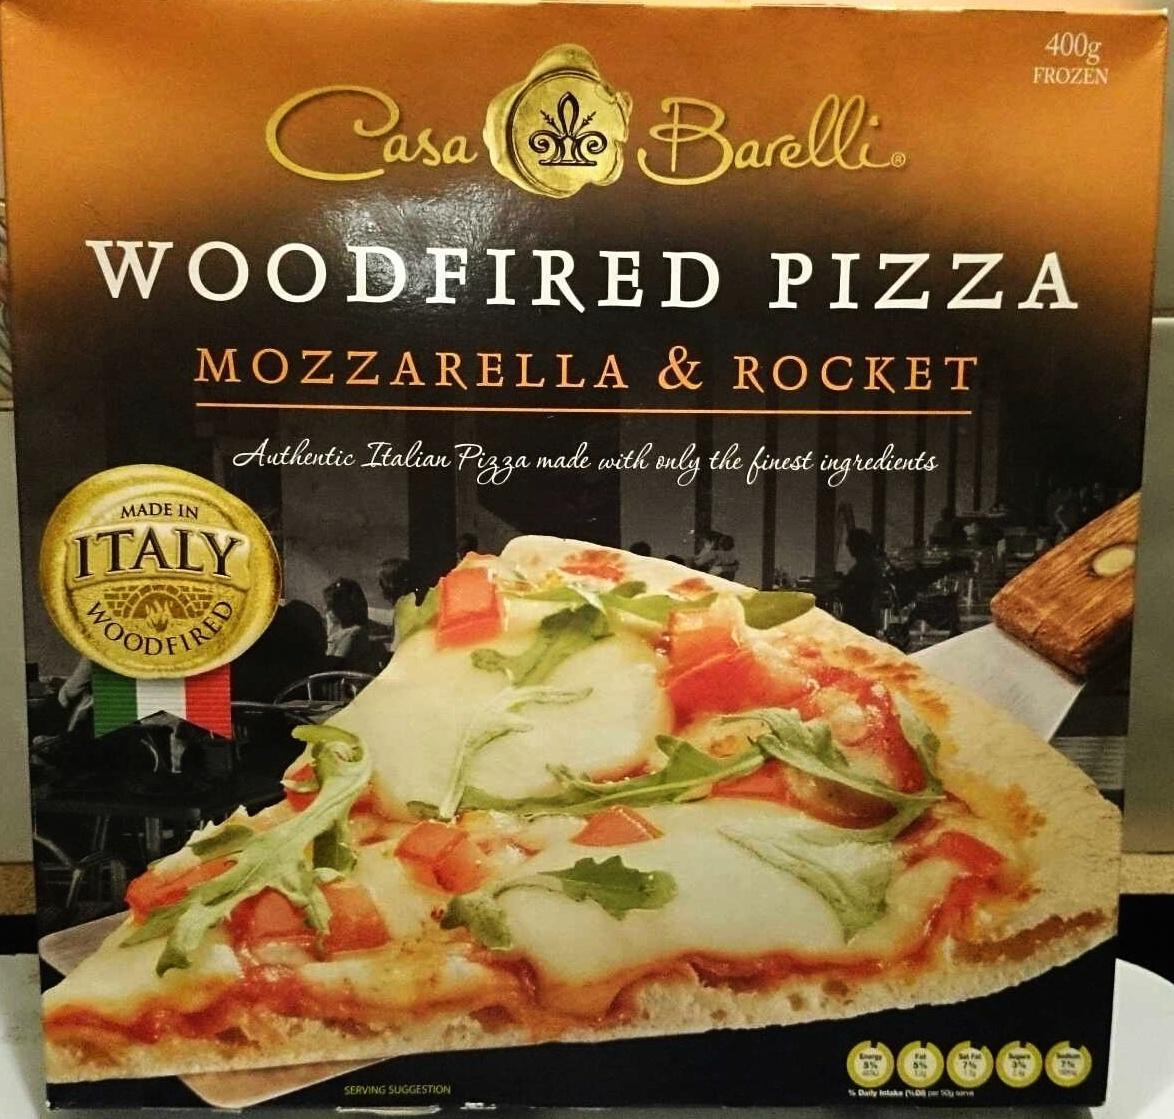 Woodfired Pizza Mozarella & Rocket - Product - en